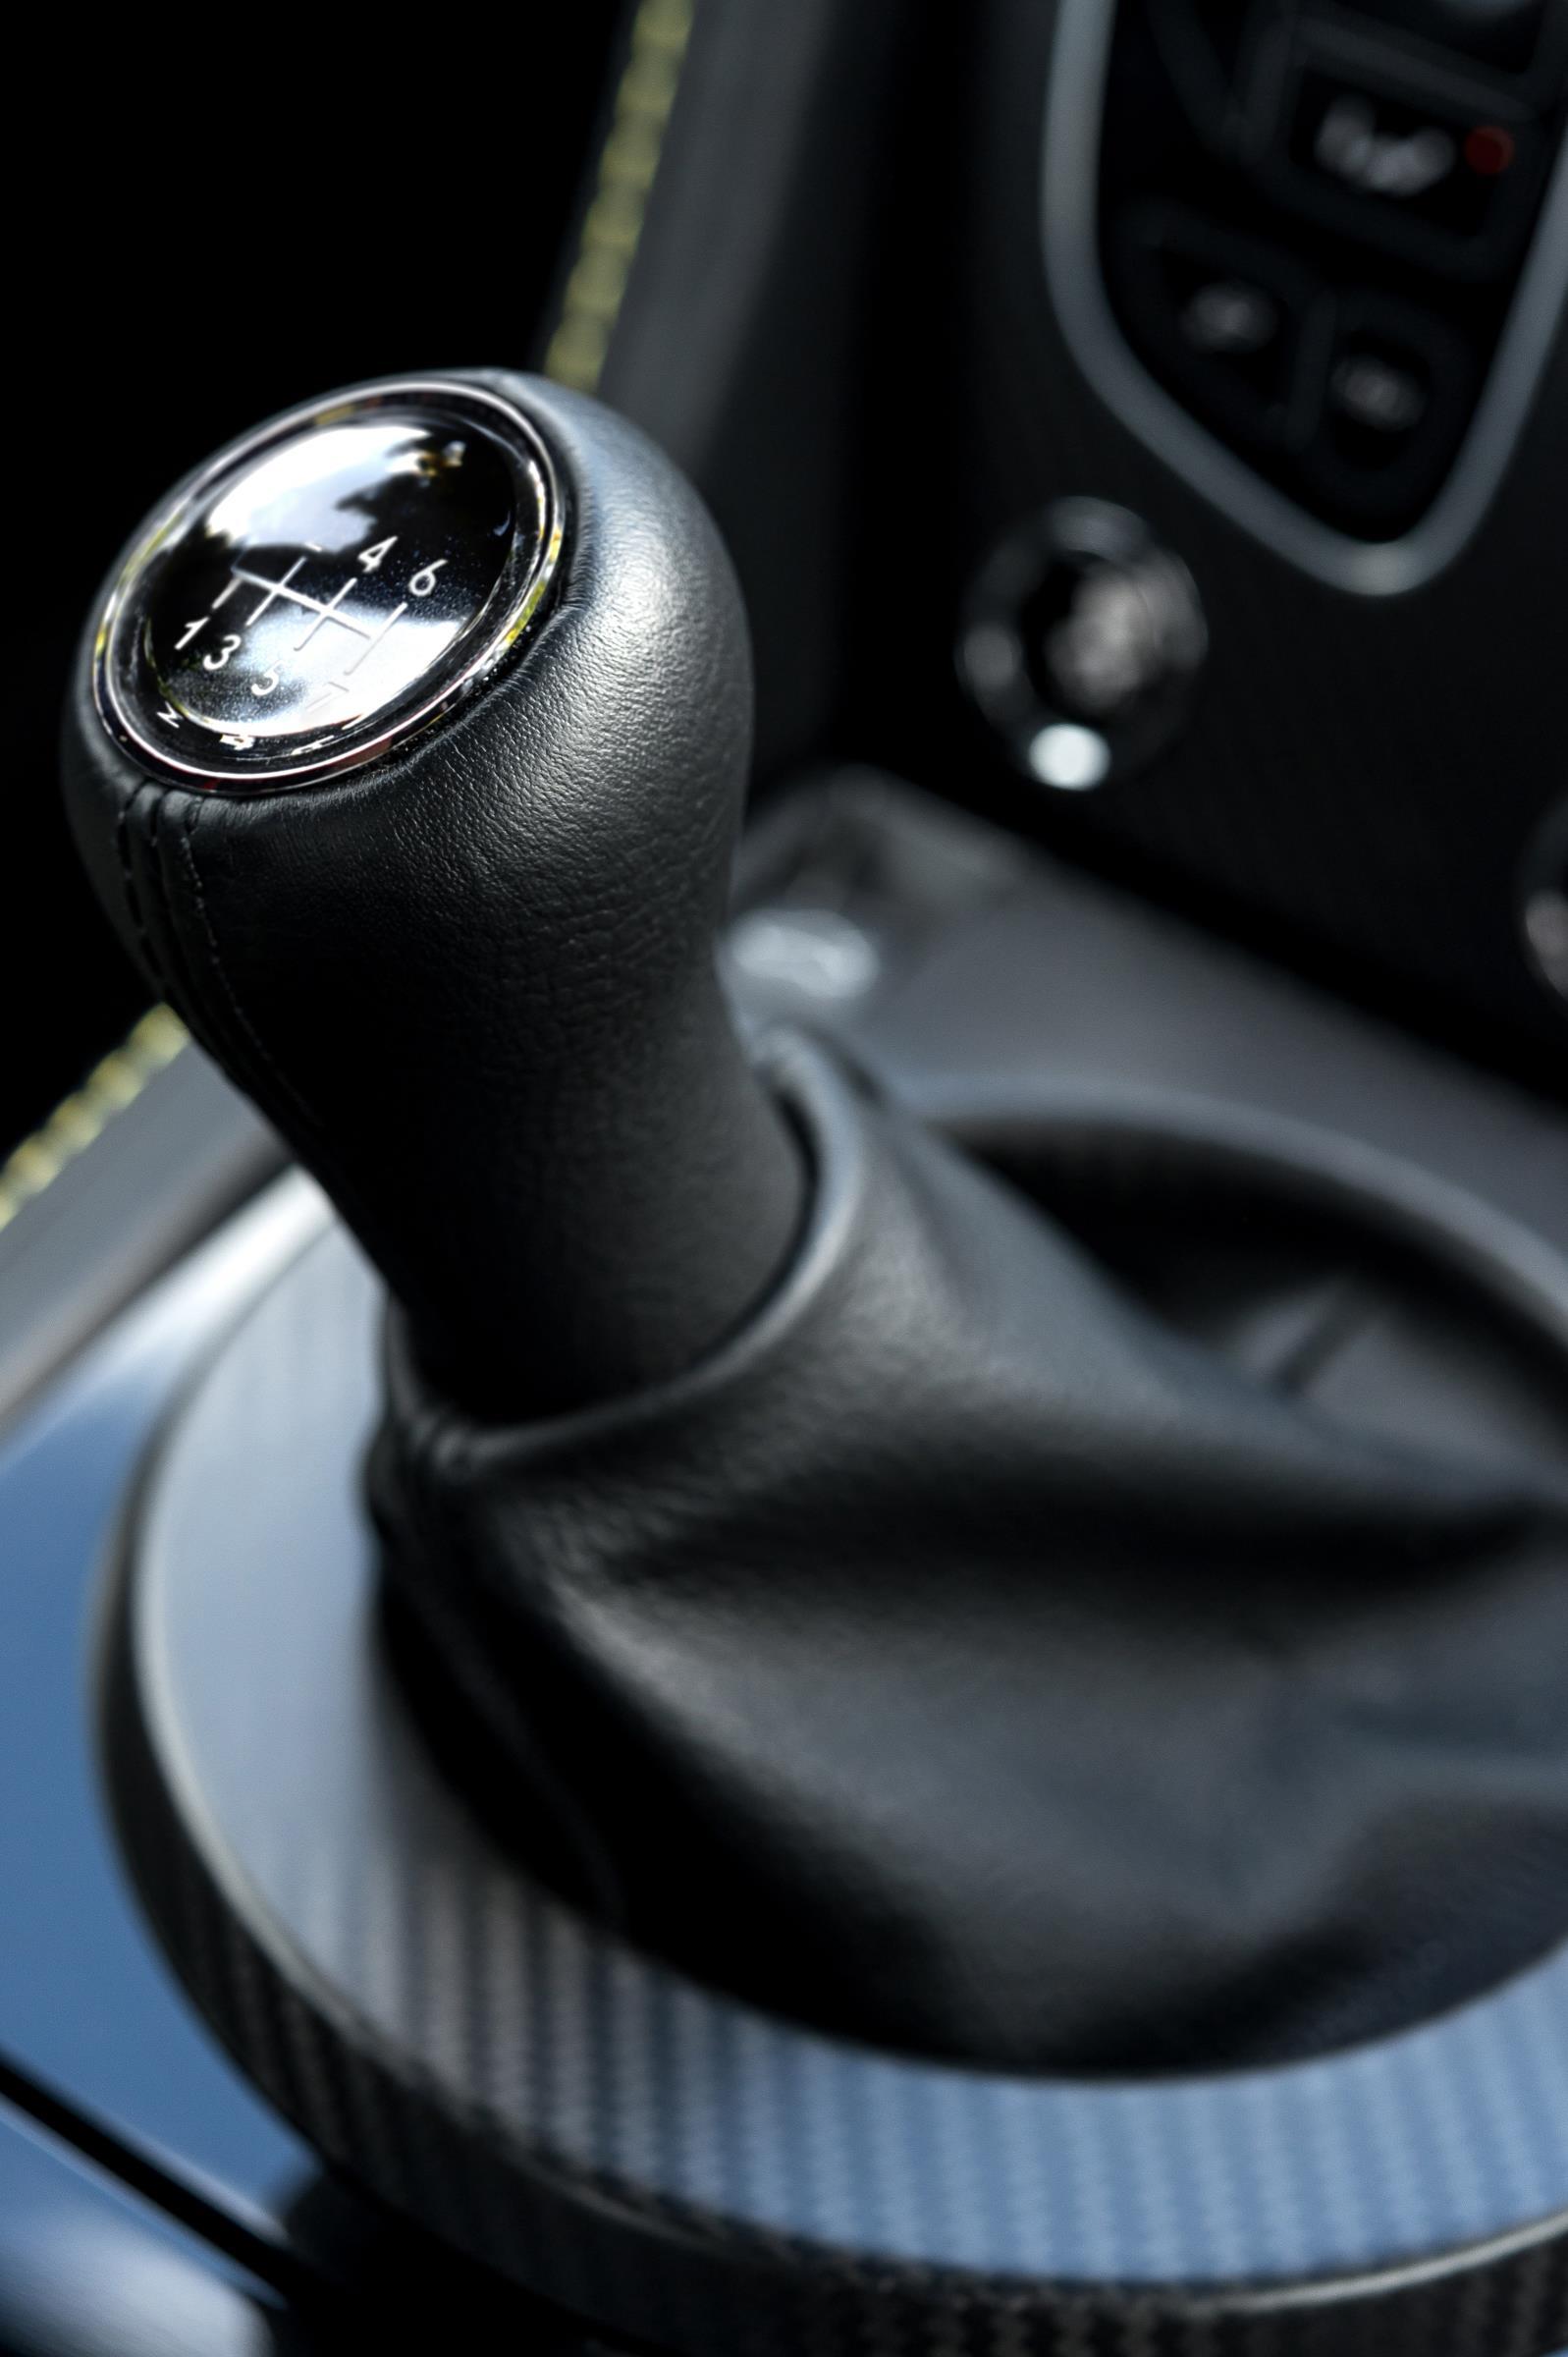 2017 Aston Martin V12 Vantage S Available With 7 Speed Dog Leg